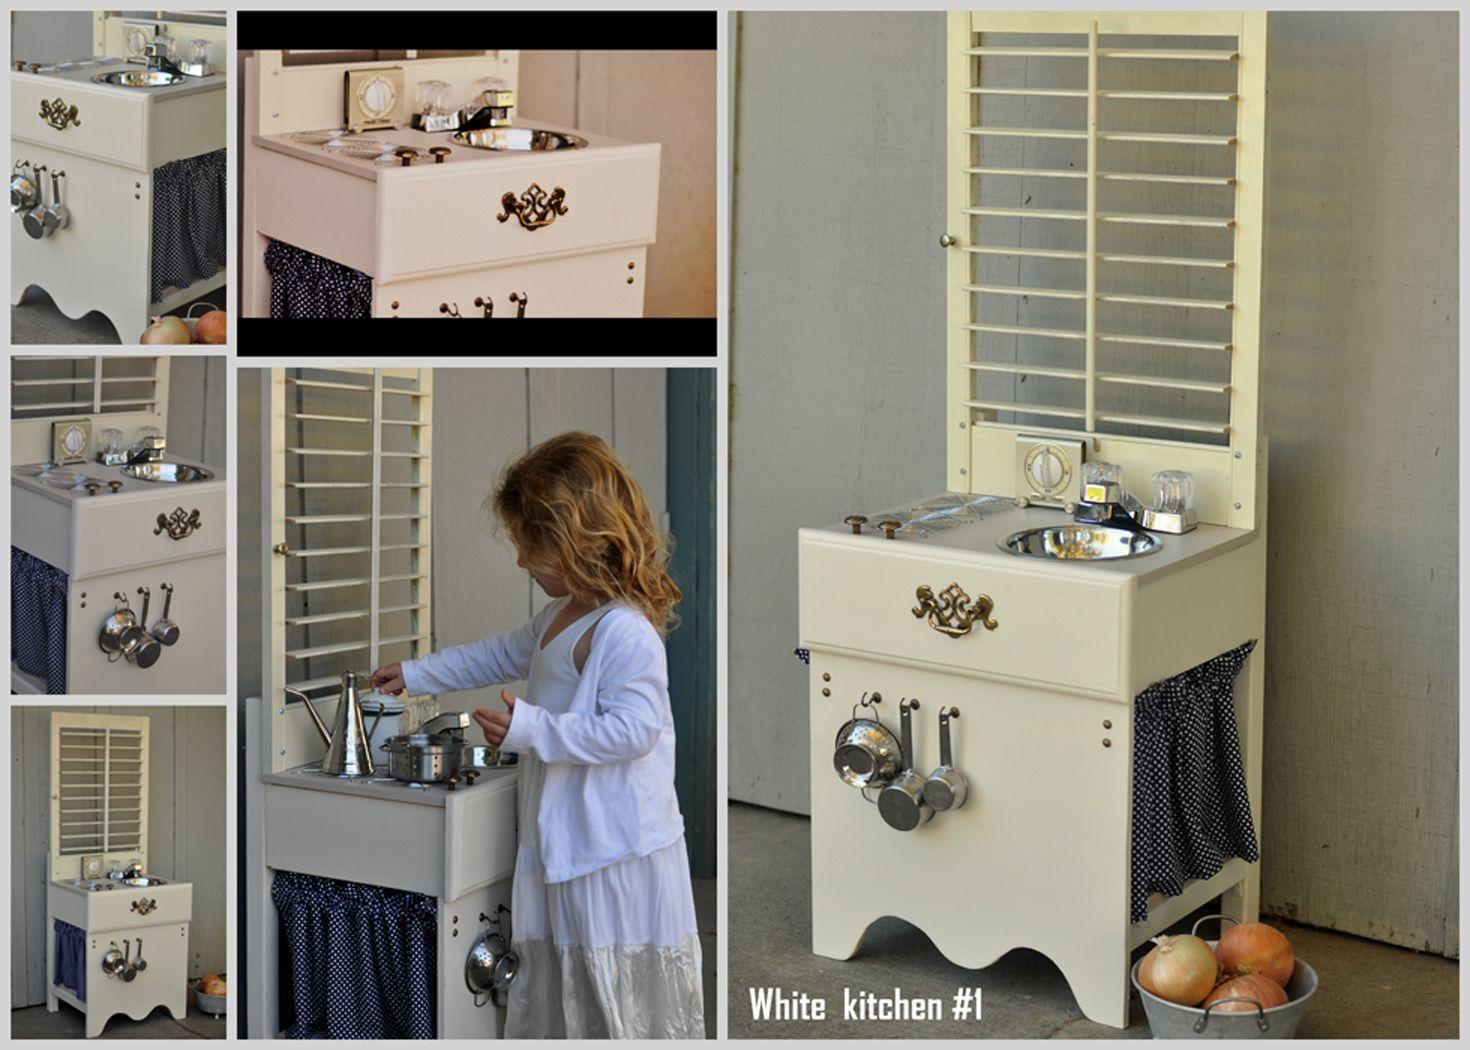 Kidkraft large pastel kitchen  My little kitchen  KCollection  My little kitchens  Pinterest